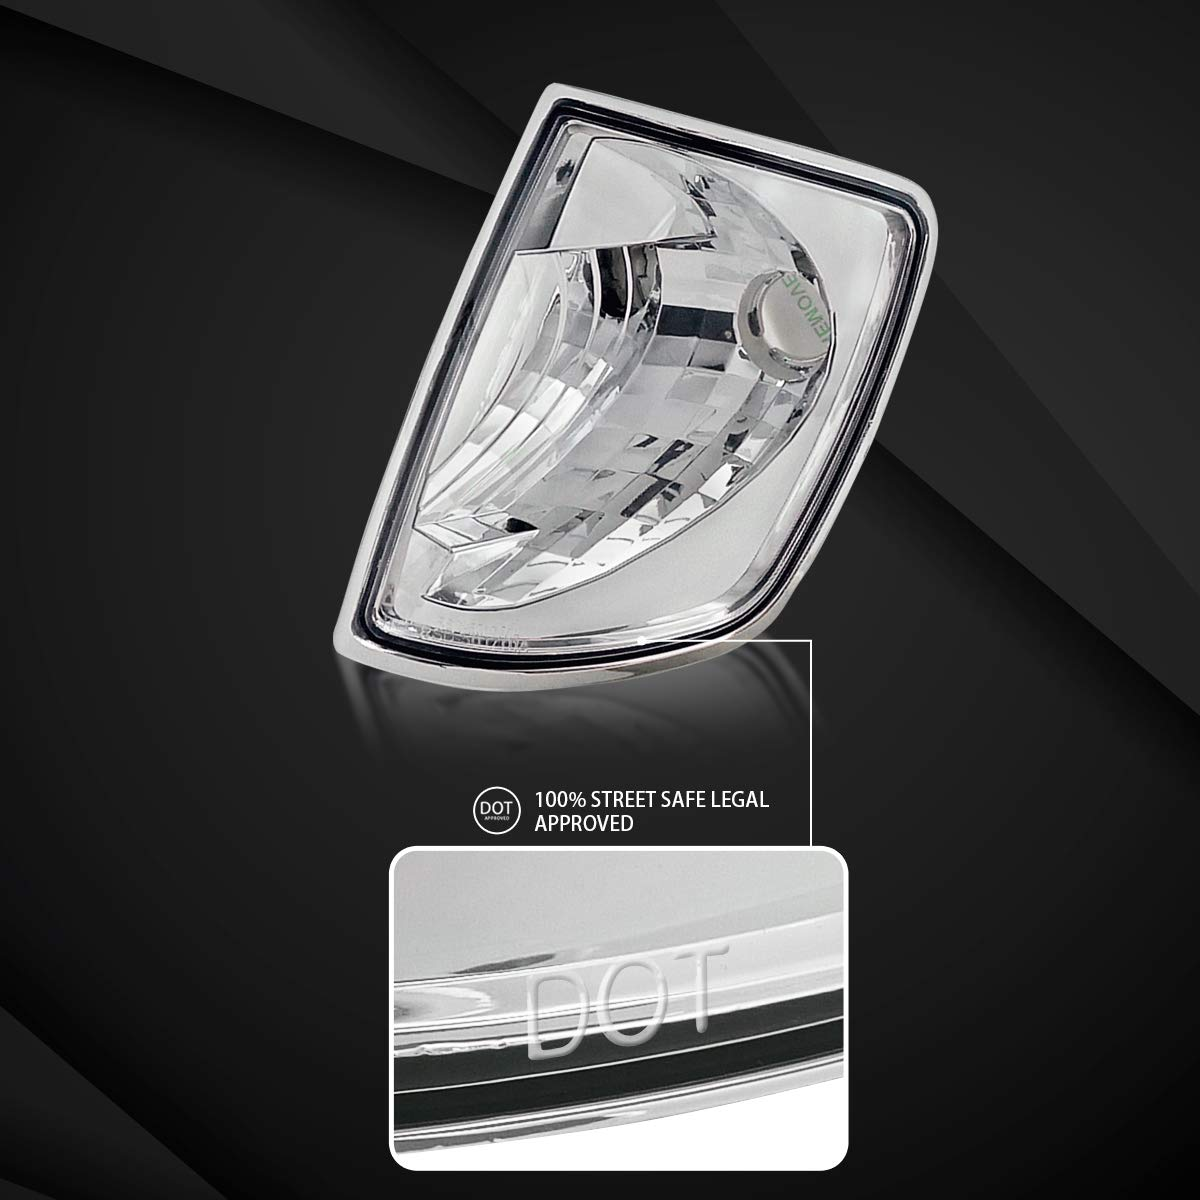 Front Engine Splash Shield For 94-95 Mercedes Benz E320 86-93 300E